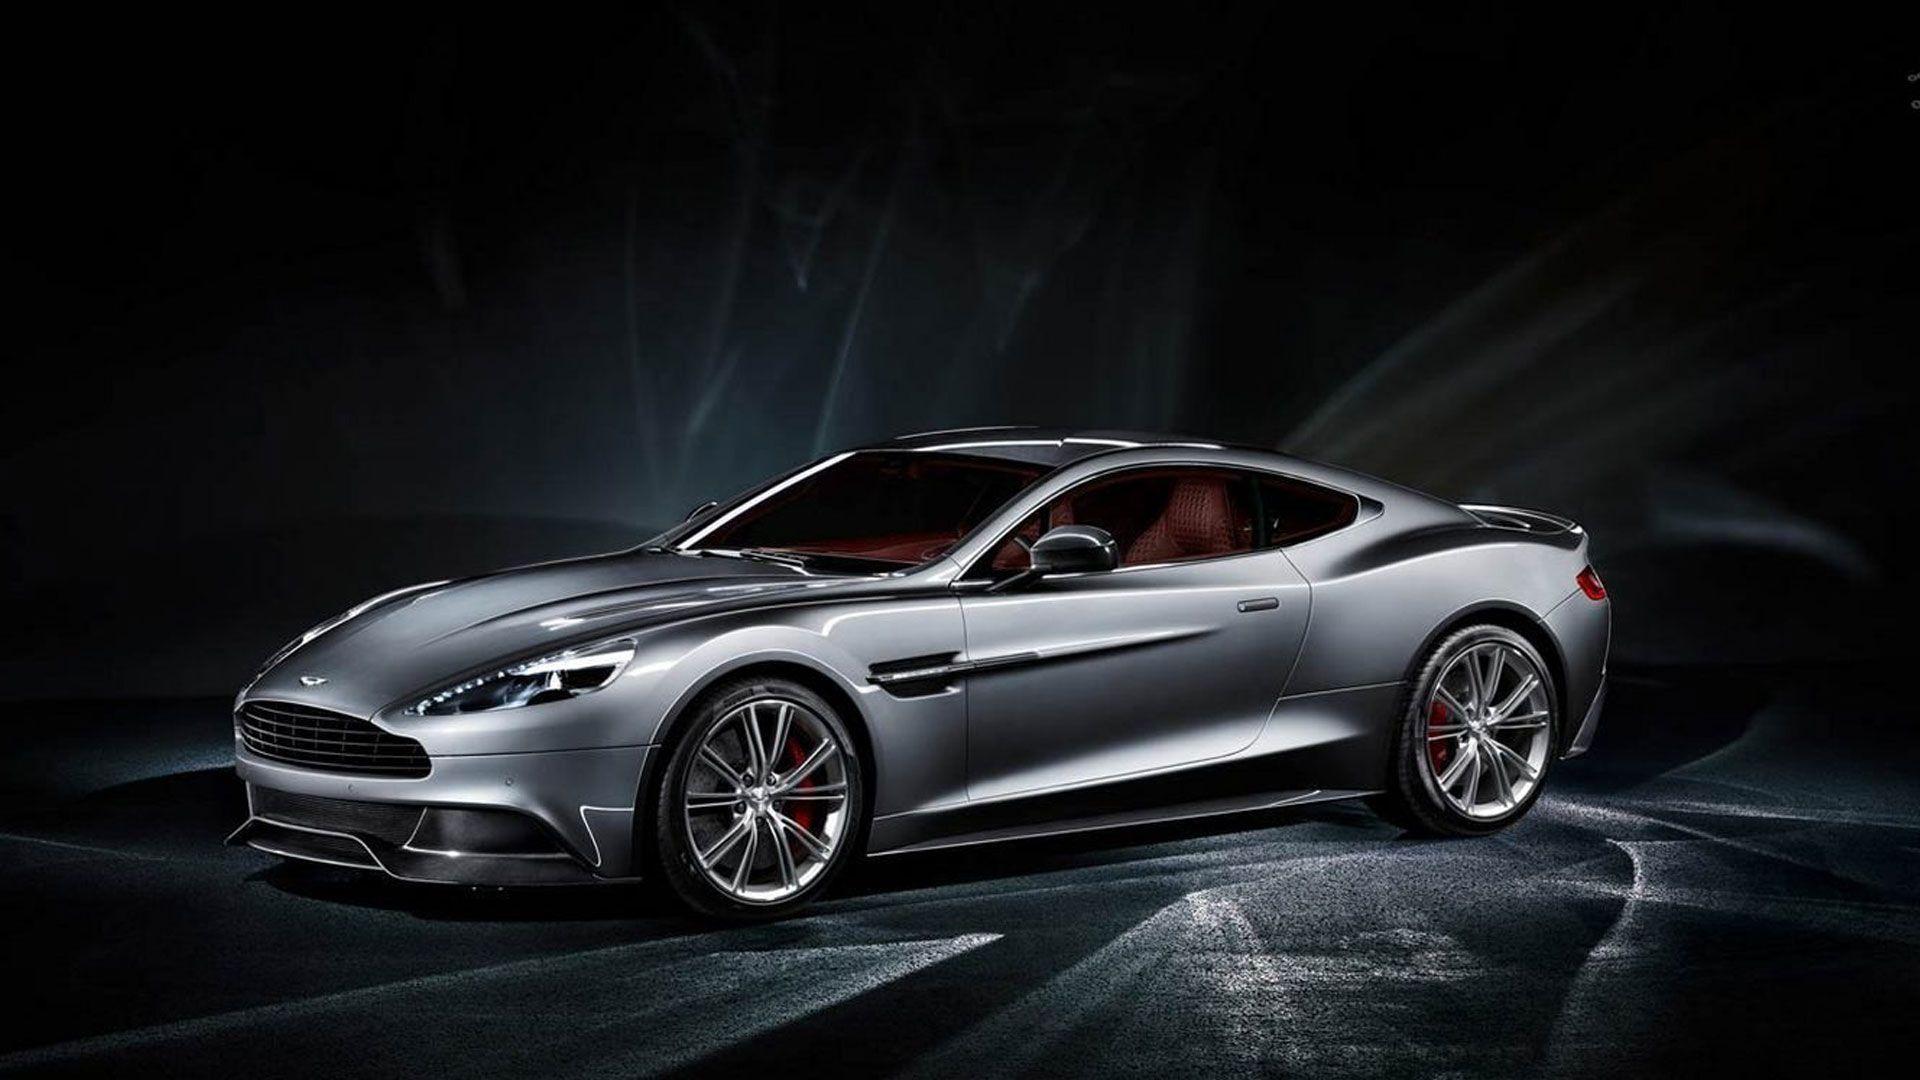 Aston Martin Vanquish Wallpapers Wallpaper